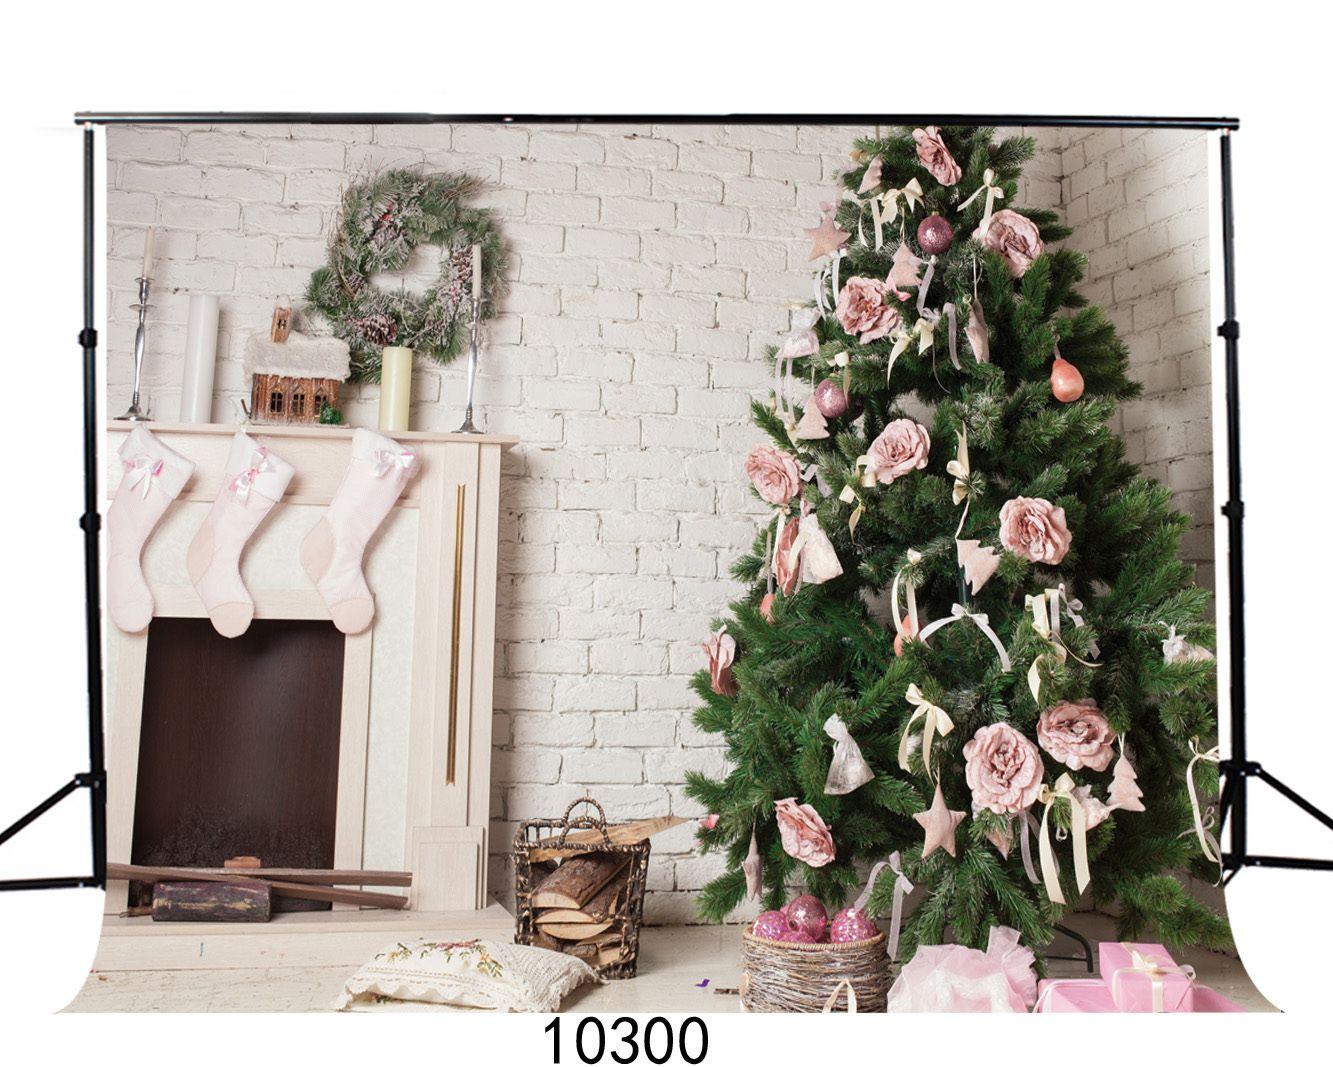 Christmas 7X5ft camera fotografica backdrops vinyl cloth photography backgrounds wedding children baby backdrop for photo studio 10300